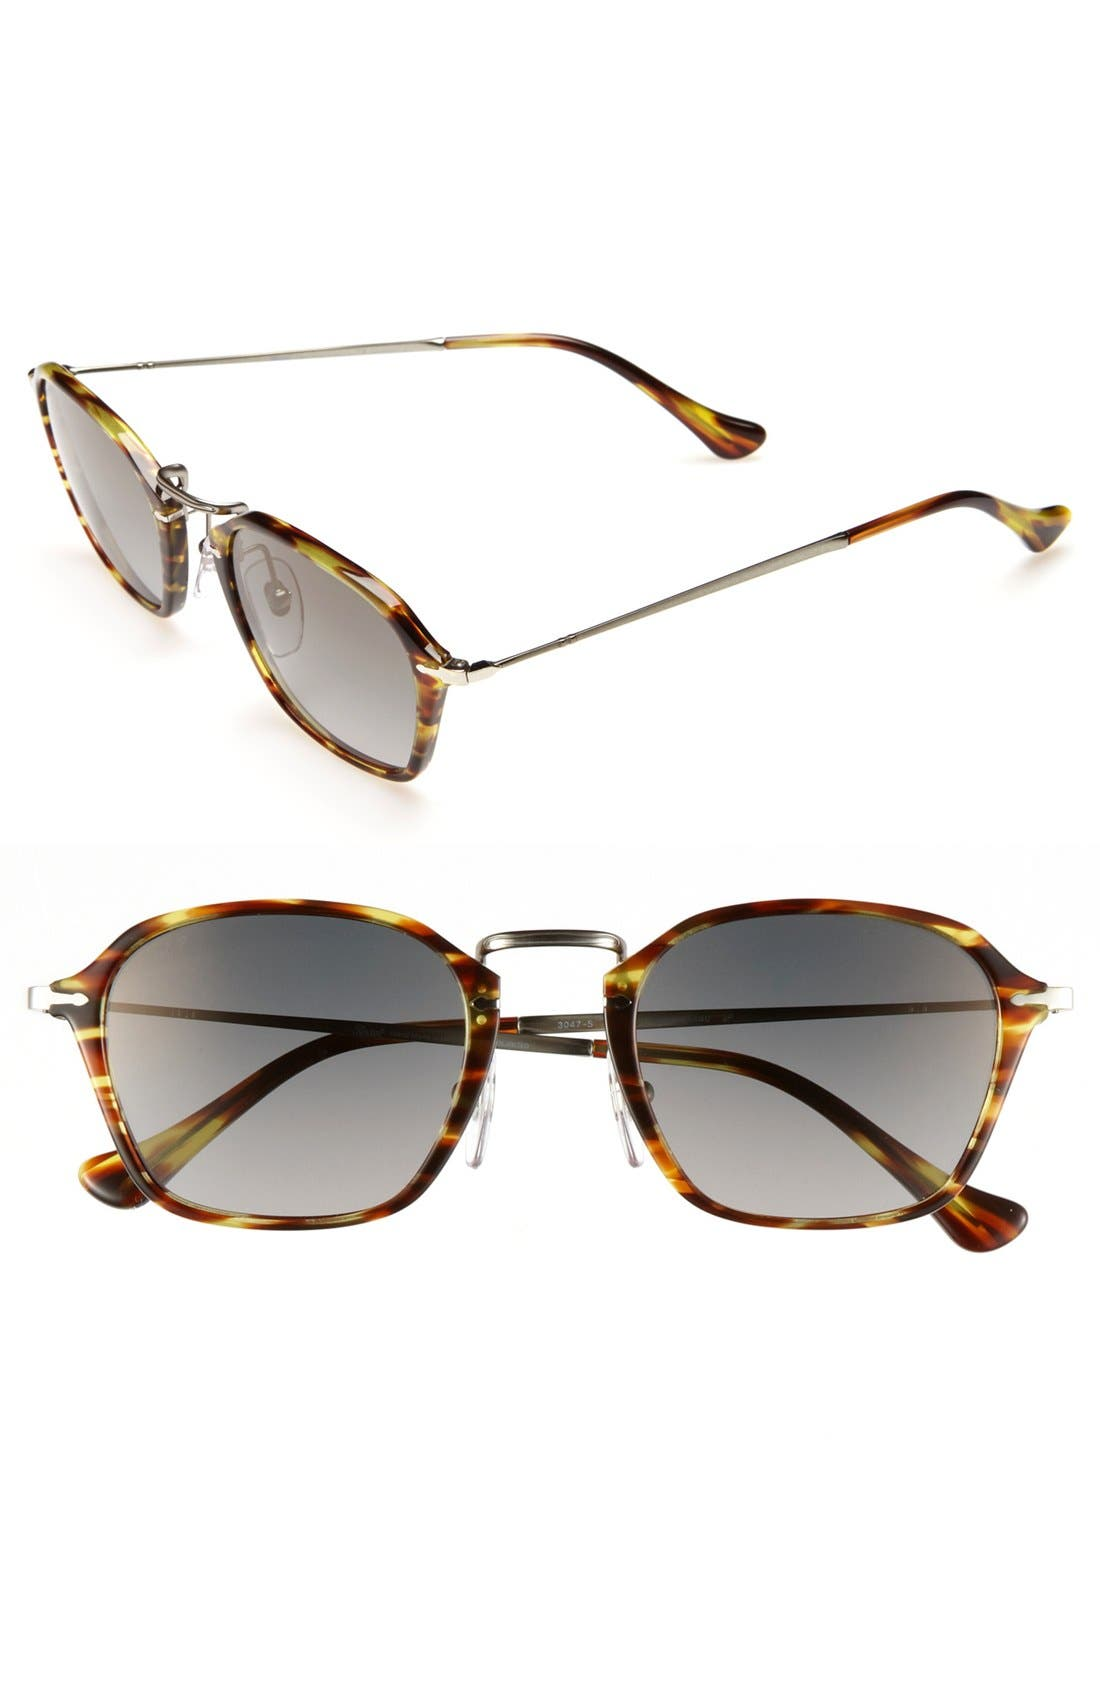 Main Image - Persol 49mm Polarized Sunglasses